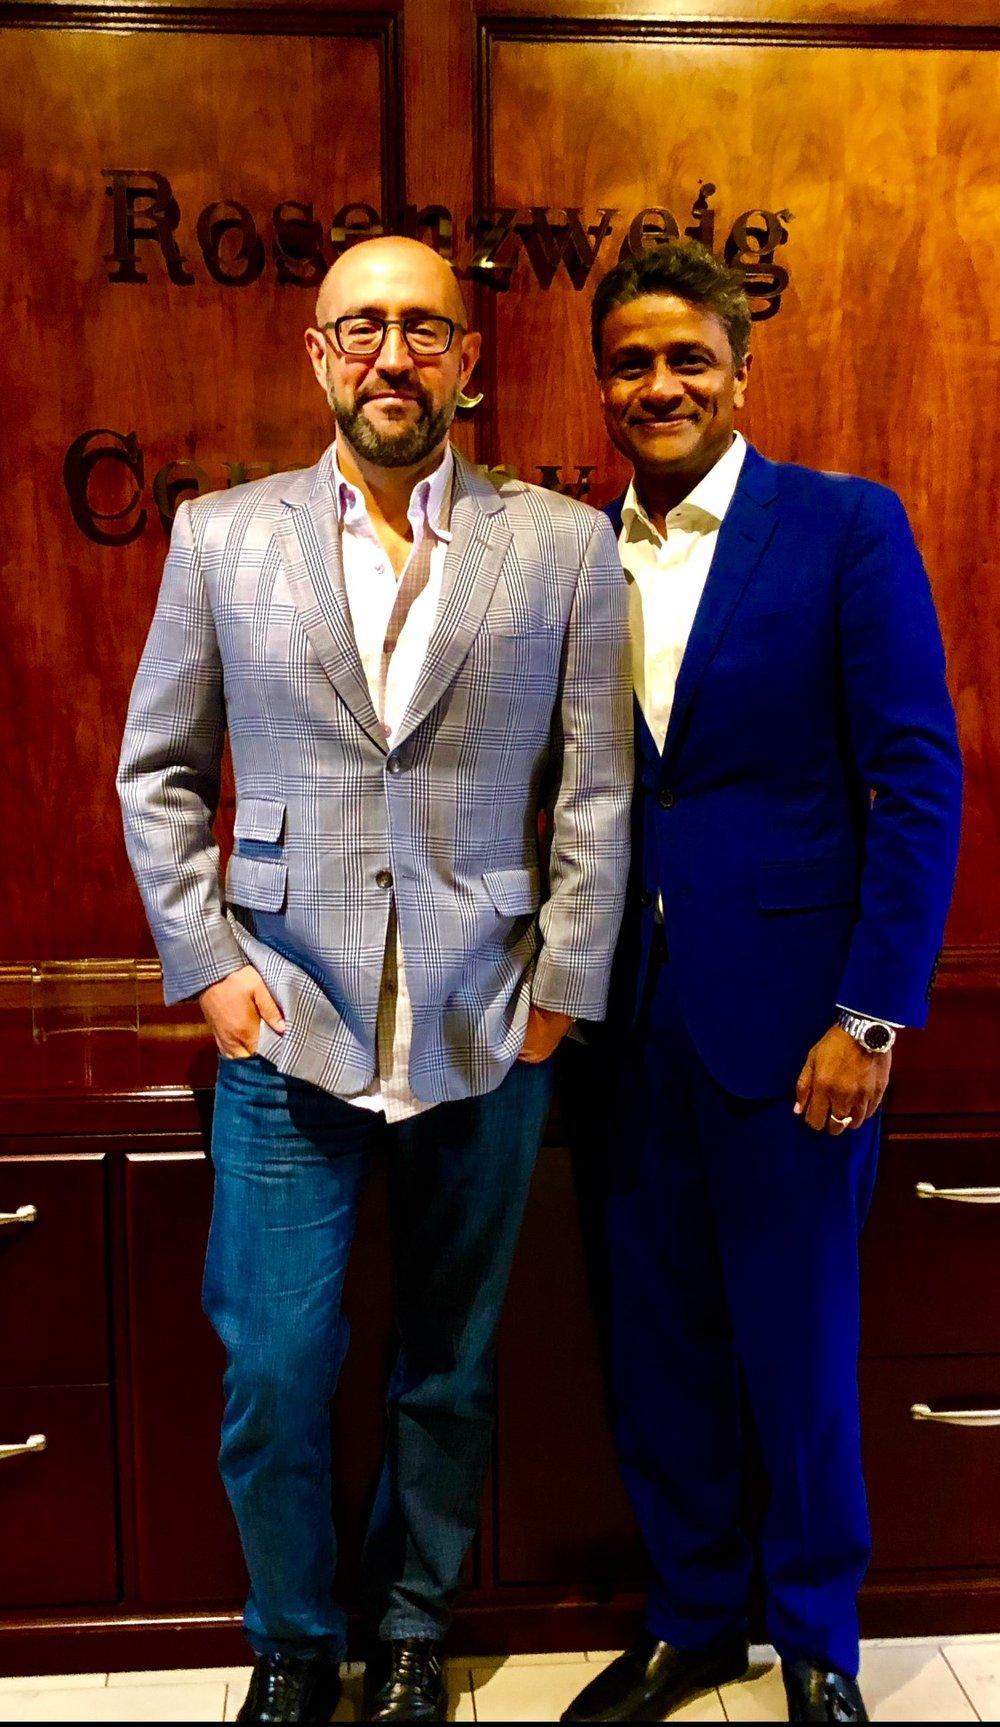 20180813 - Jay Rosenzweig & Rontu Basu, India Based Partner.jpg